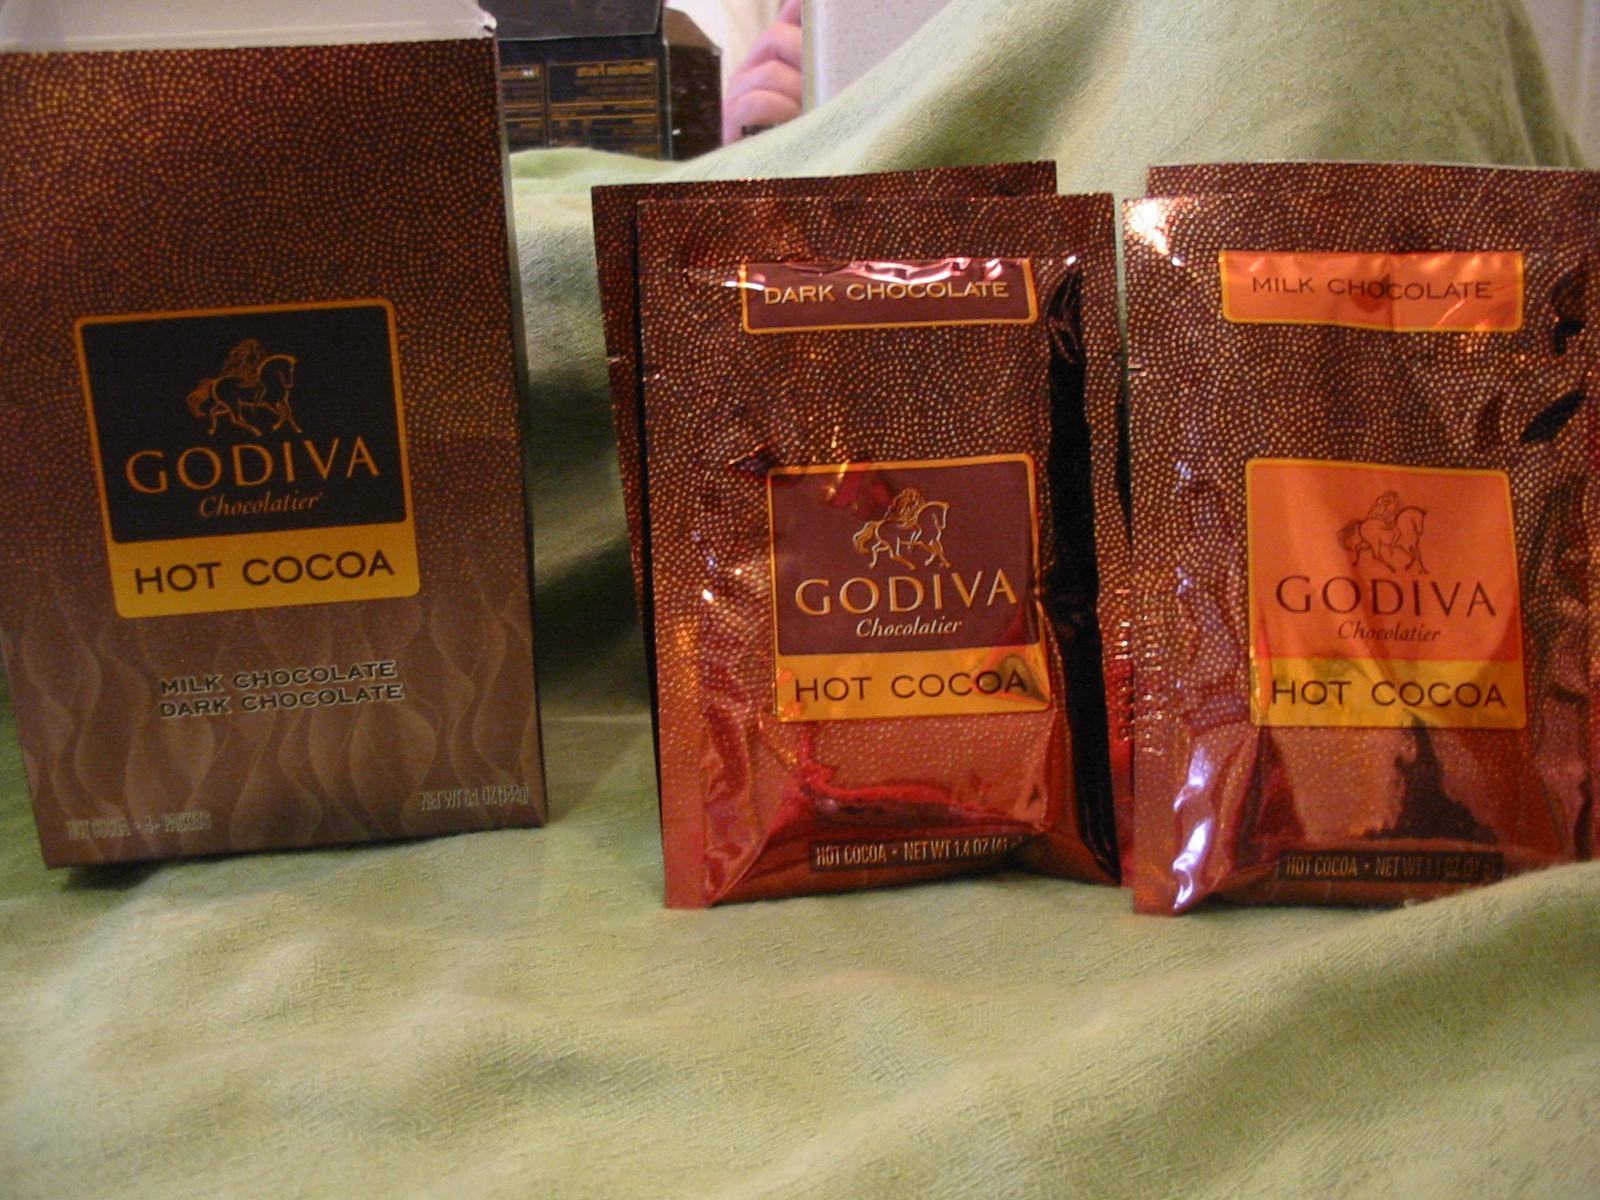 Godiva Hot Chocolate  The Chocolate Cult Godiva Halloween Fall 2010